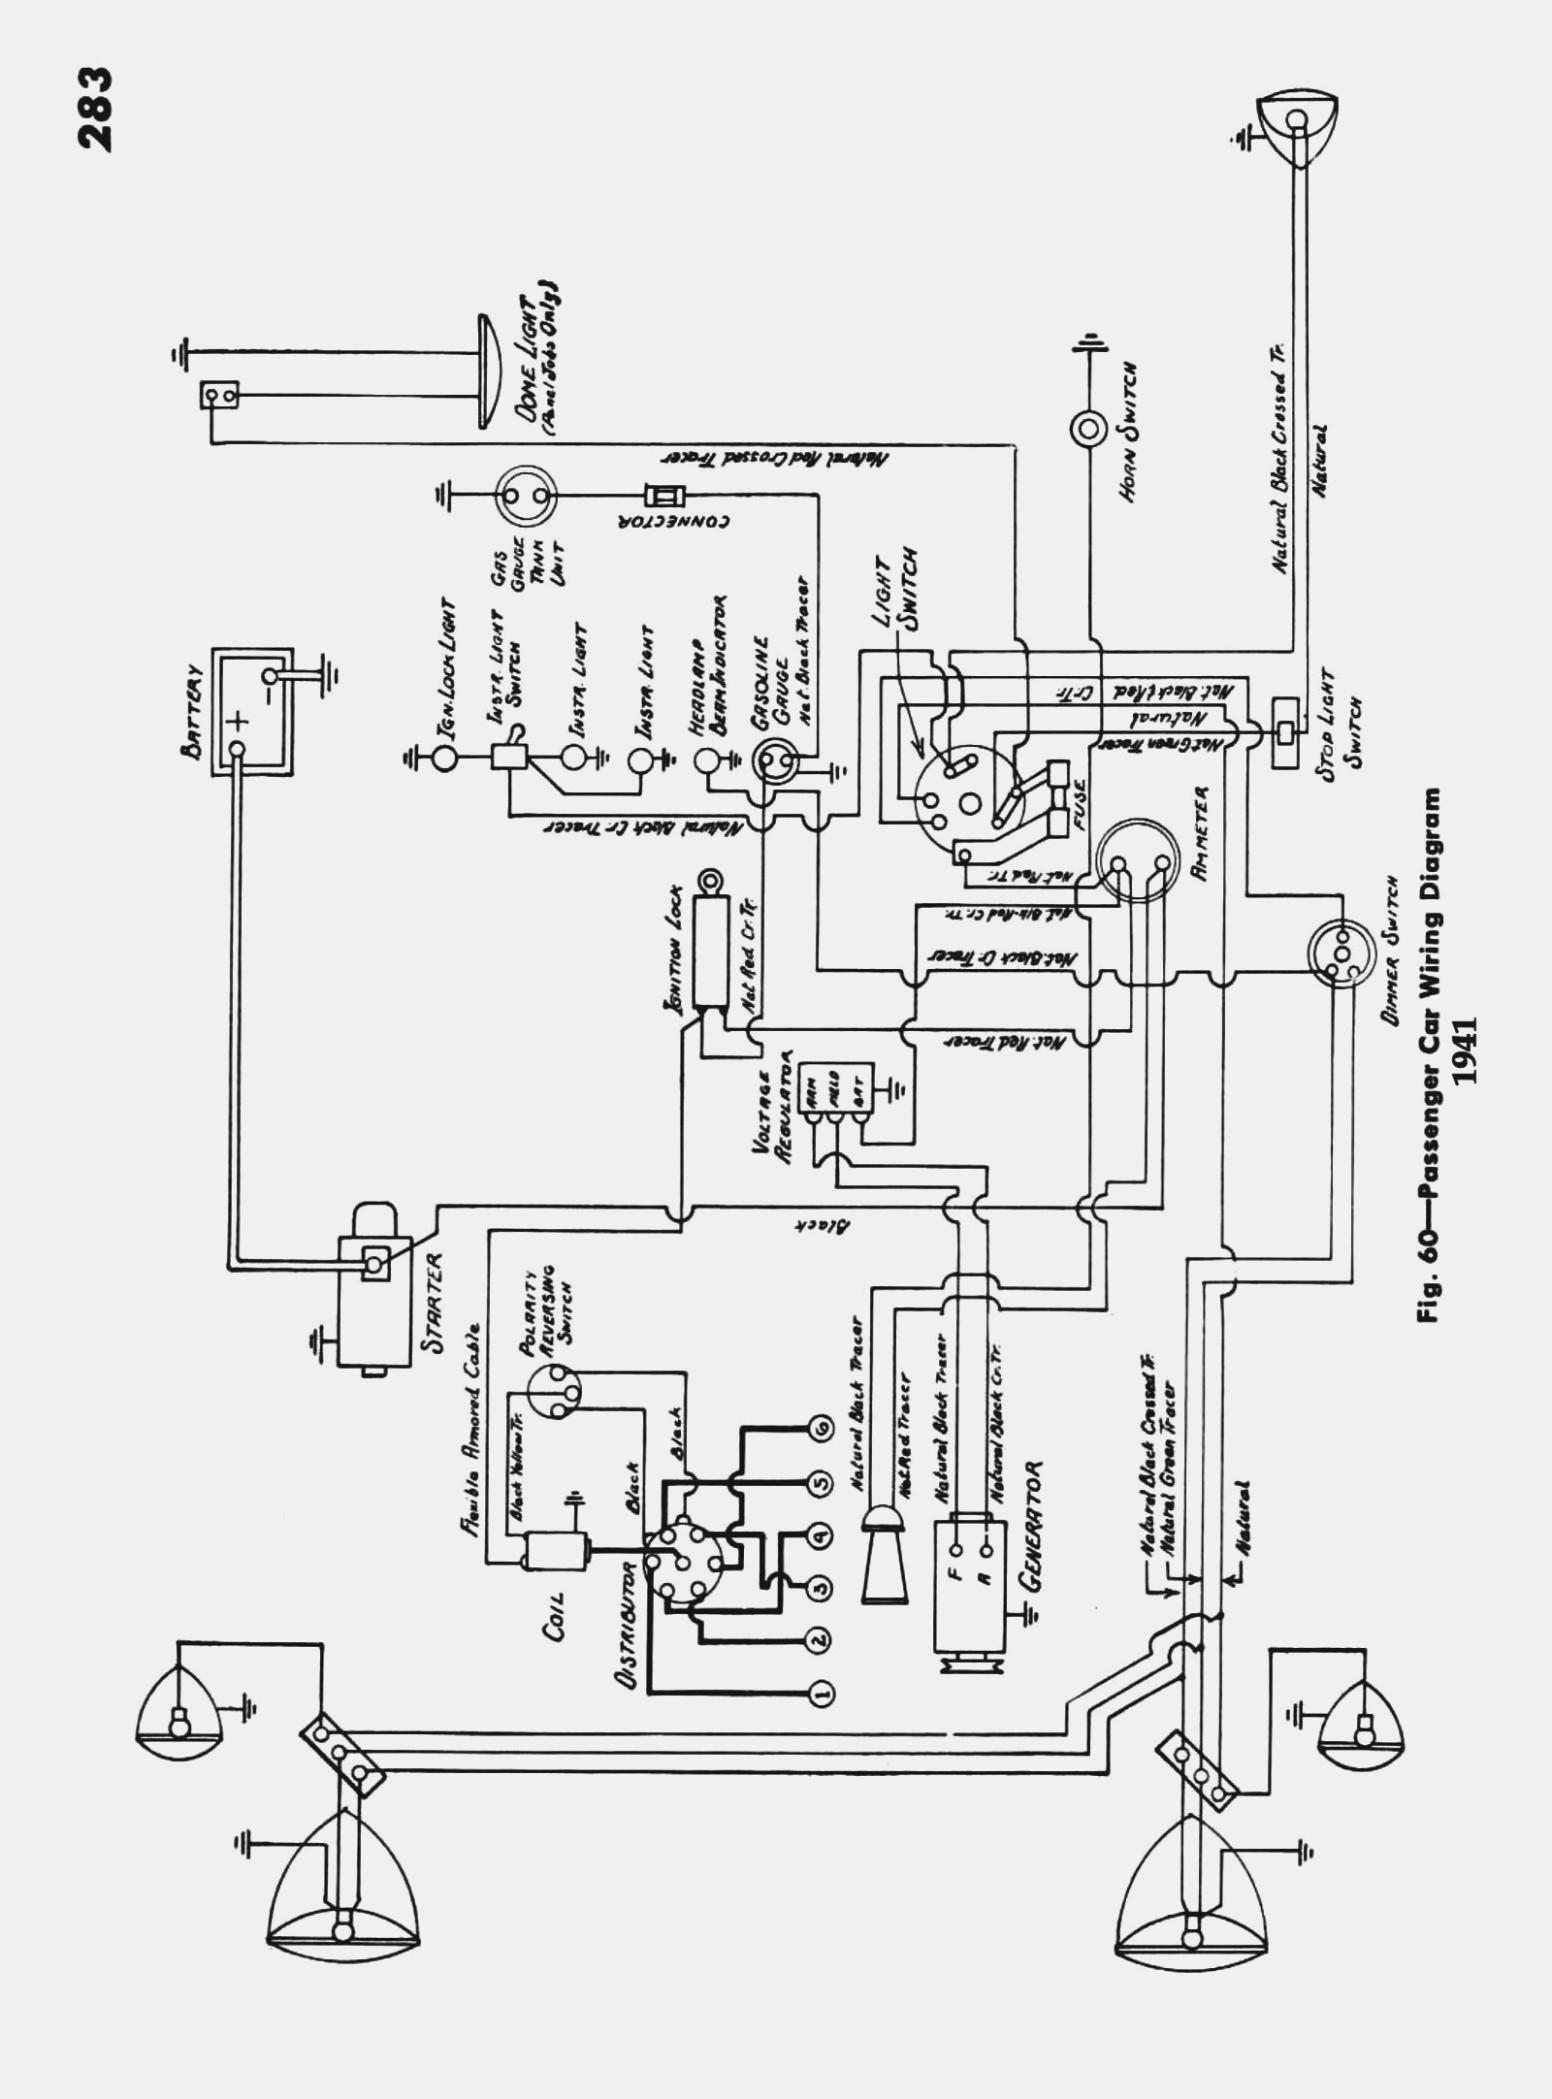 hight resolution of international truck dpf wiring diagram wiring diagraminternational truck dpf wiring diagram wiring diagram u2013 international